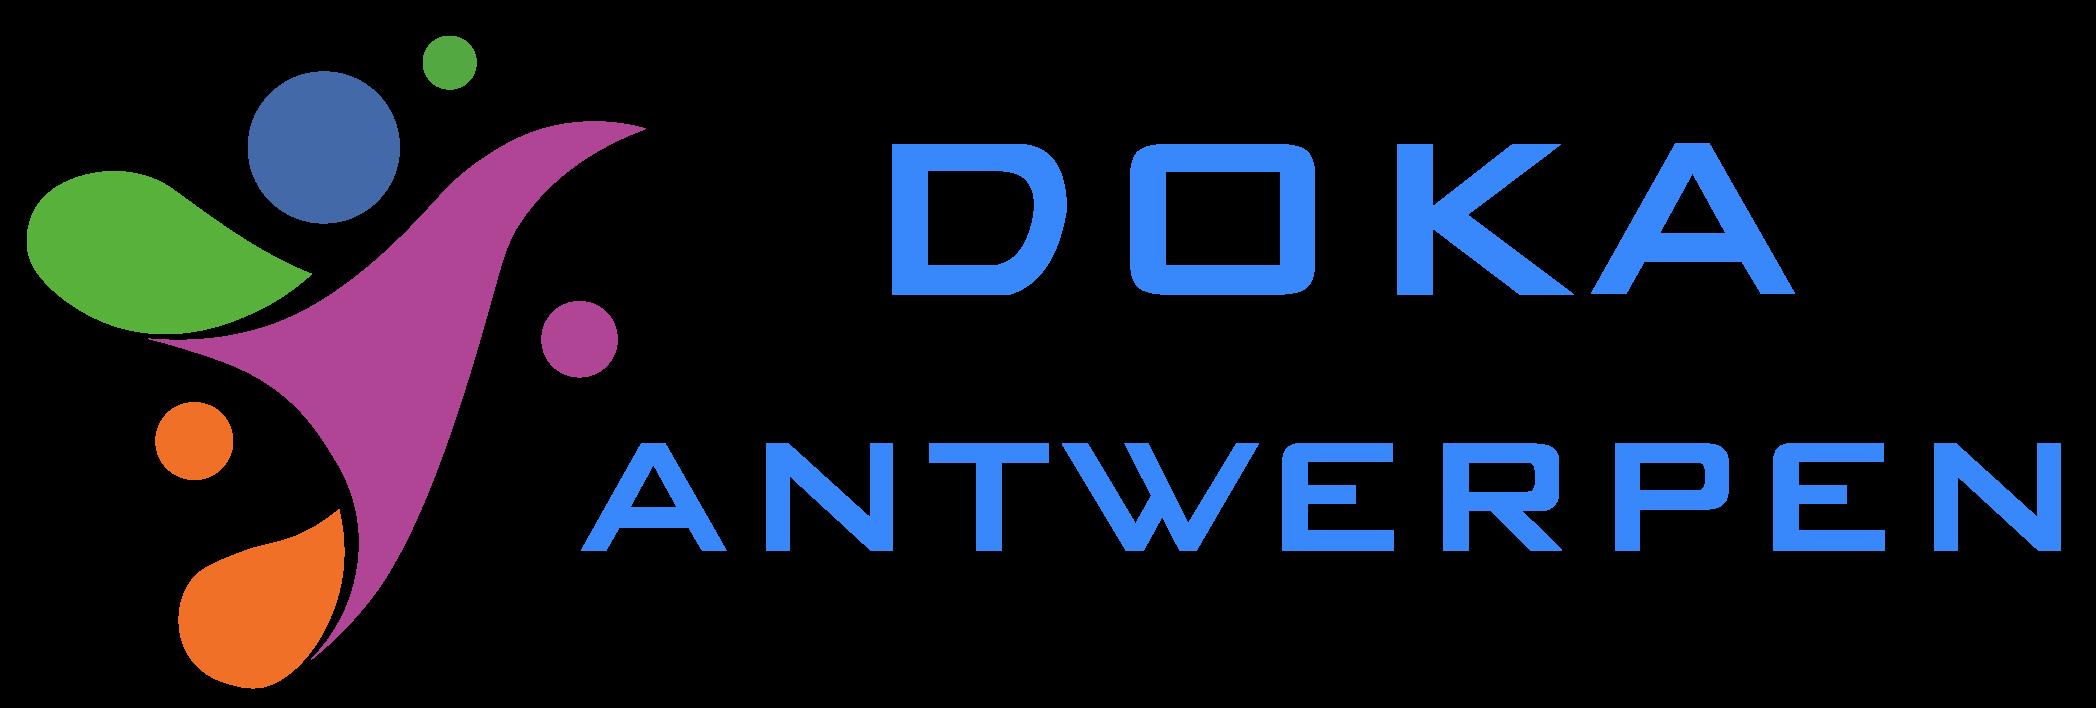 Doka Antwerpen